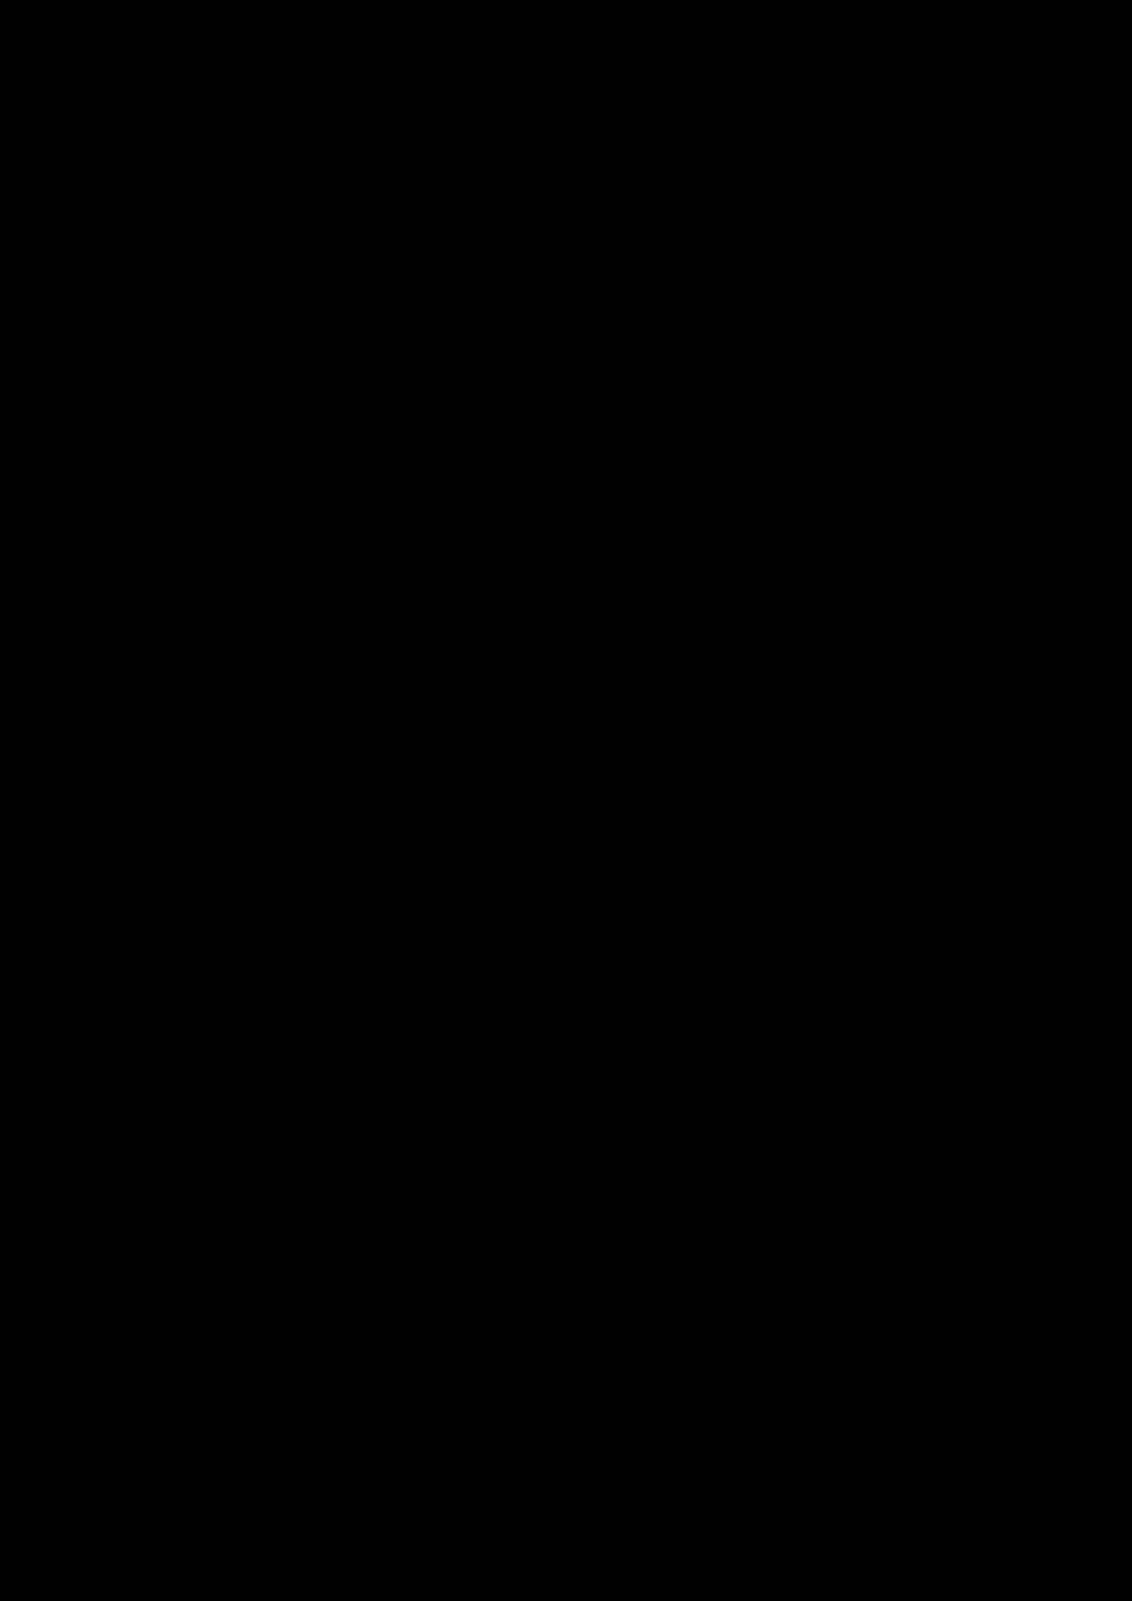 Belyiy sokol slide, Image 38